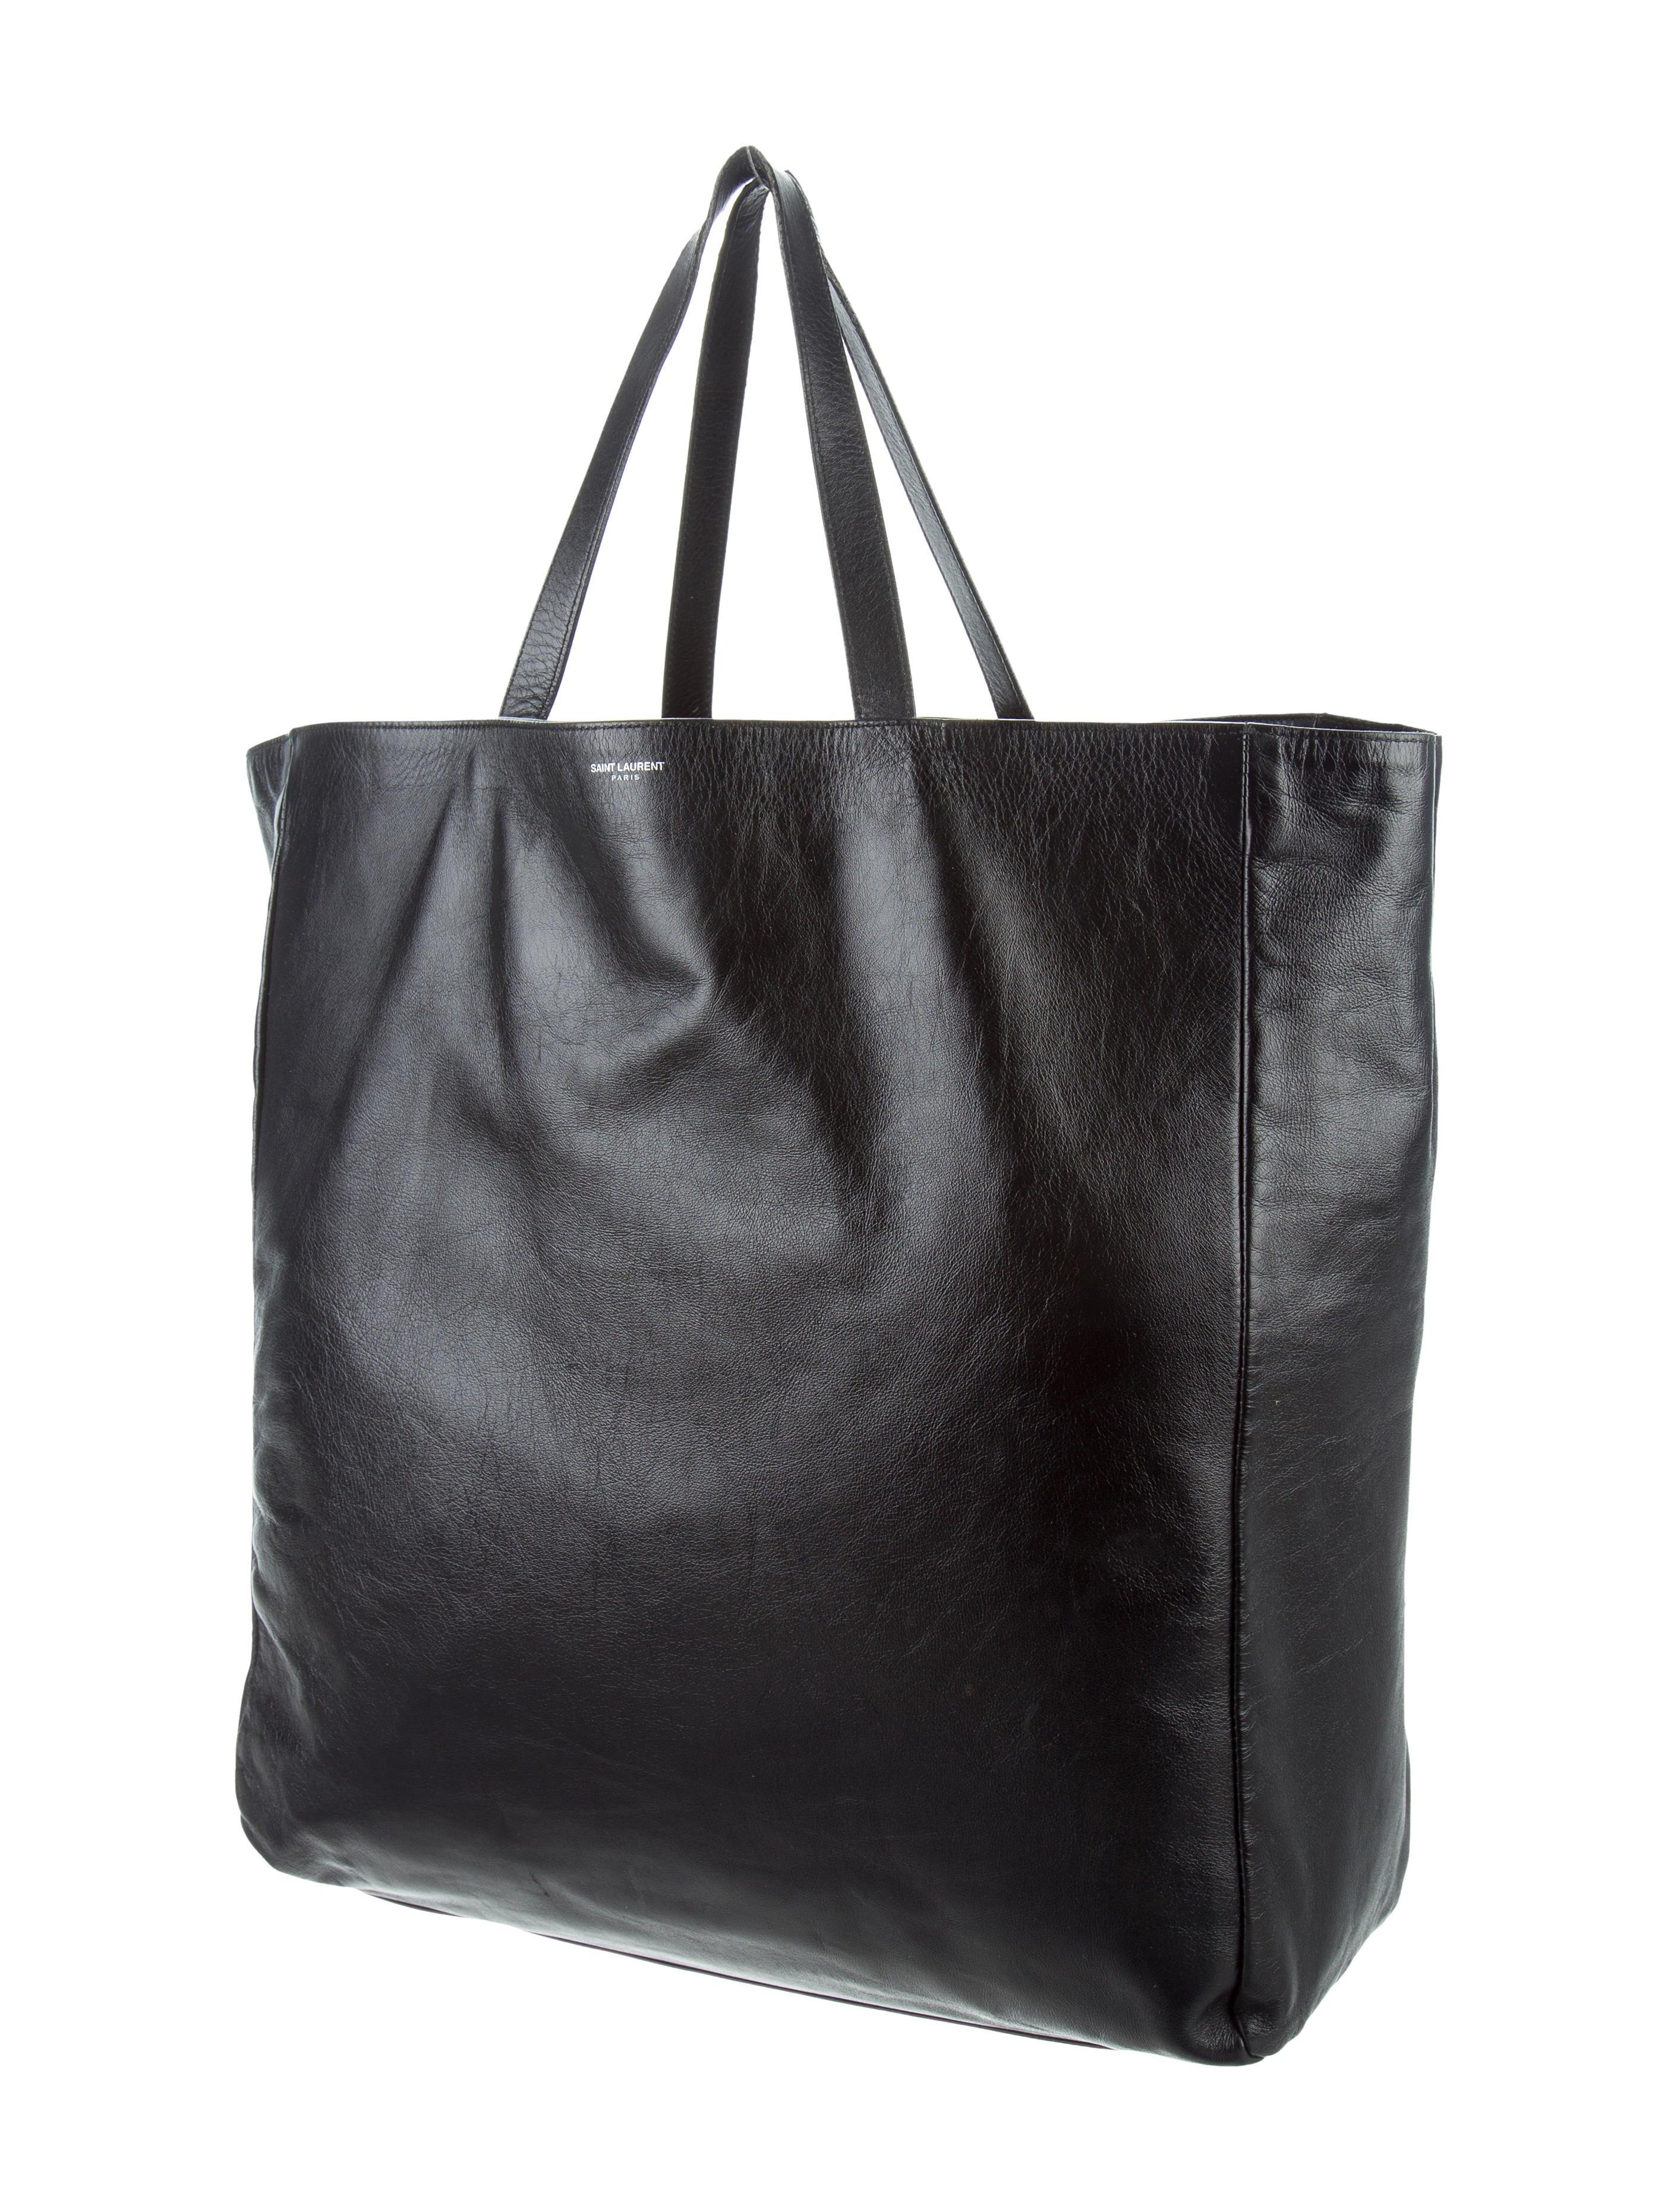 saint laurent reversible shopper tote handbags. Black Bedroom Furniture Sets. Home Design Ideas